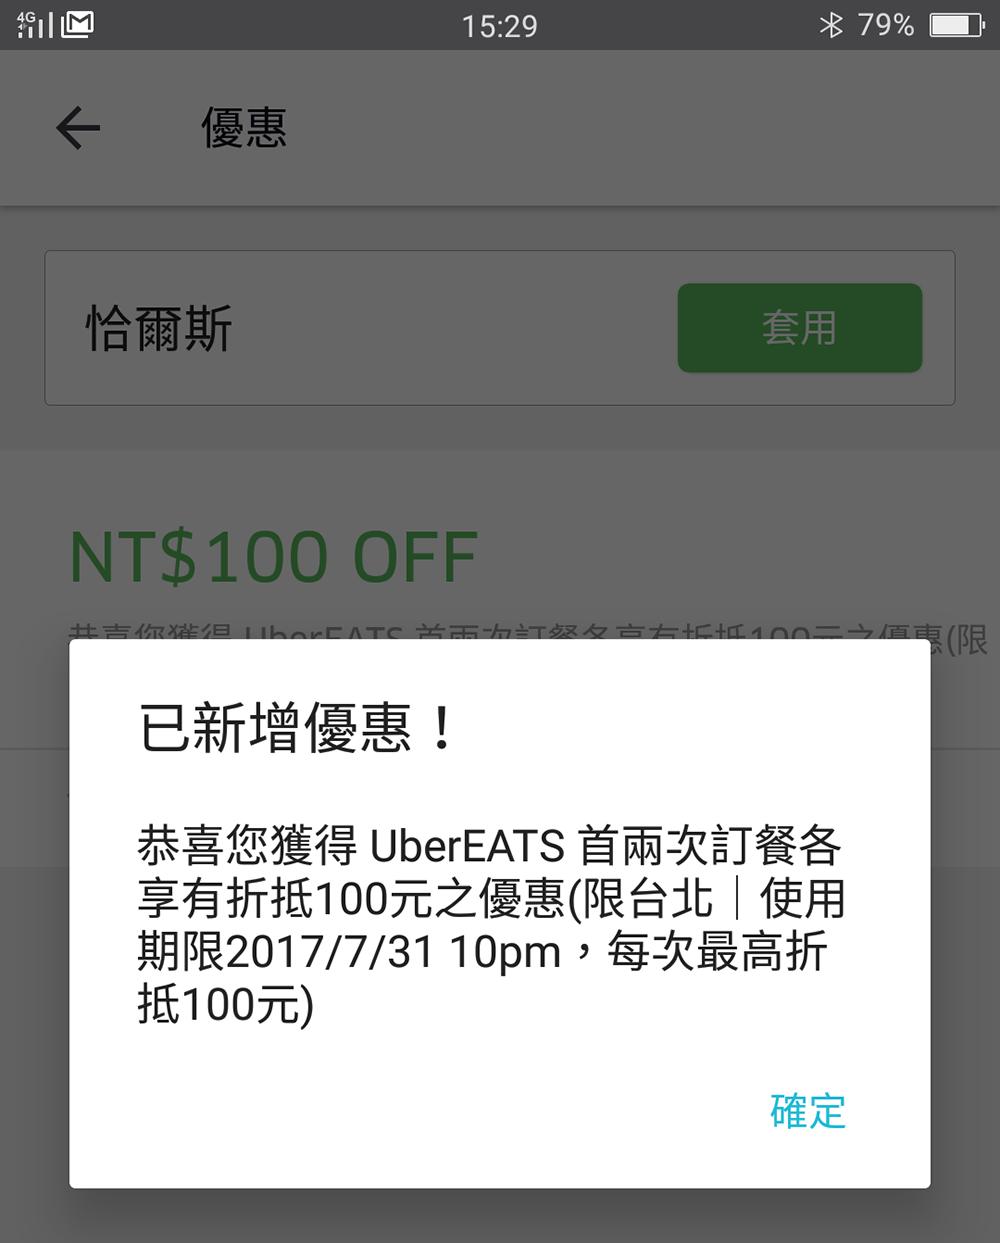 UberEATS 新北